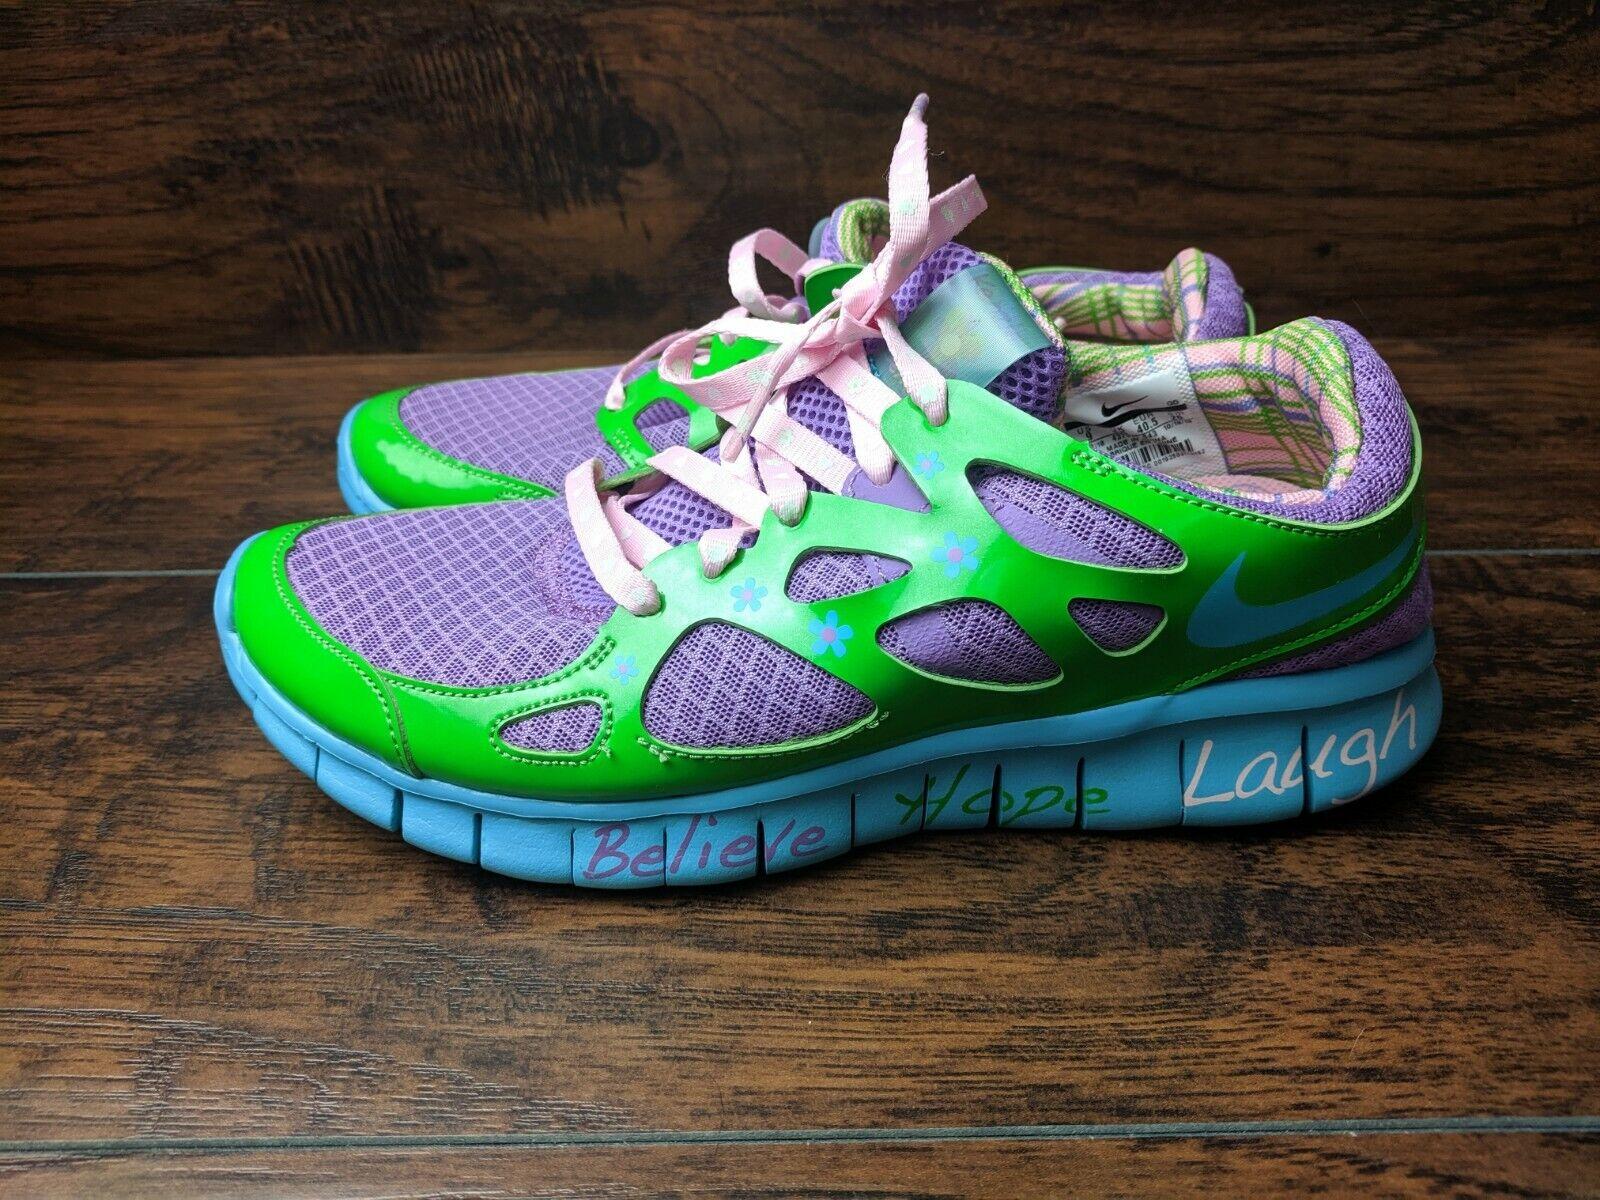 Nike Free  Run 2 DB Dimensione femminile 9 Doernebecher viola blu QS 437527 -54  a buon mercato